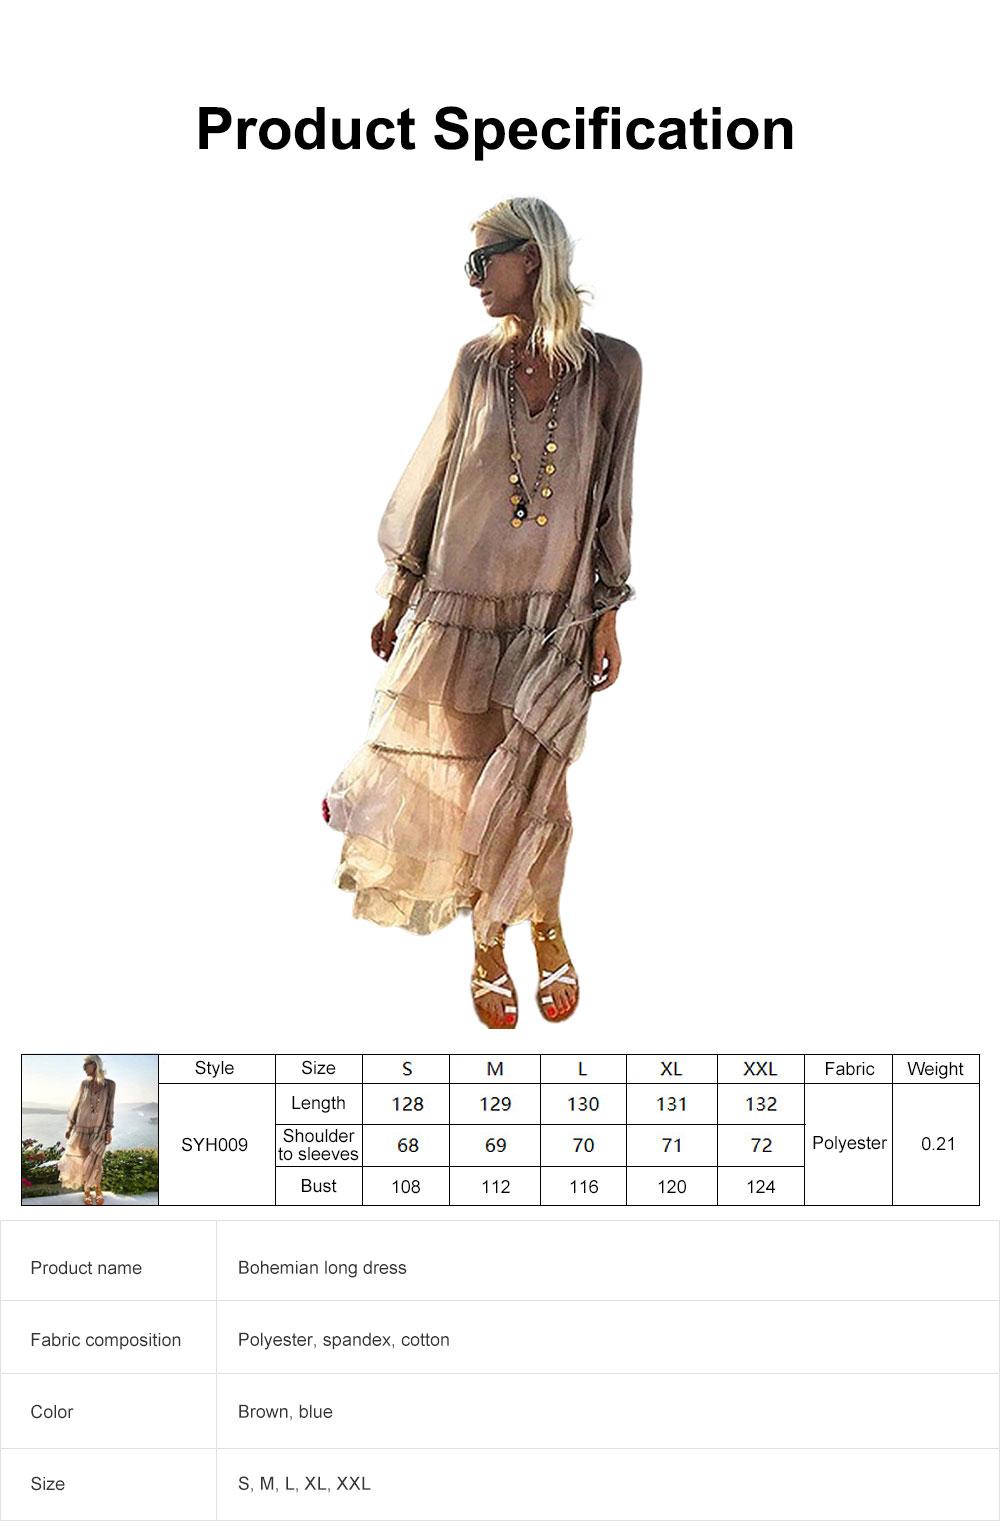 V-neck Ruffled Long-sleeve Resort Boho Dress for Vocation, Bohemian Long Dress, Lantern Sleeve Lotus Leaf Dress Hem Combination Design for Summer Autumn Dress 2019 6